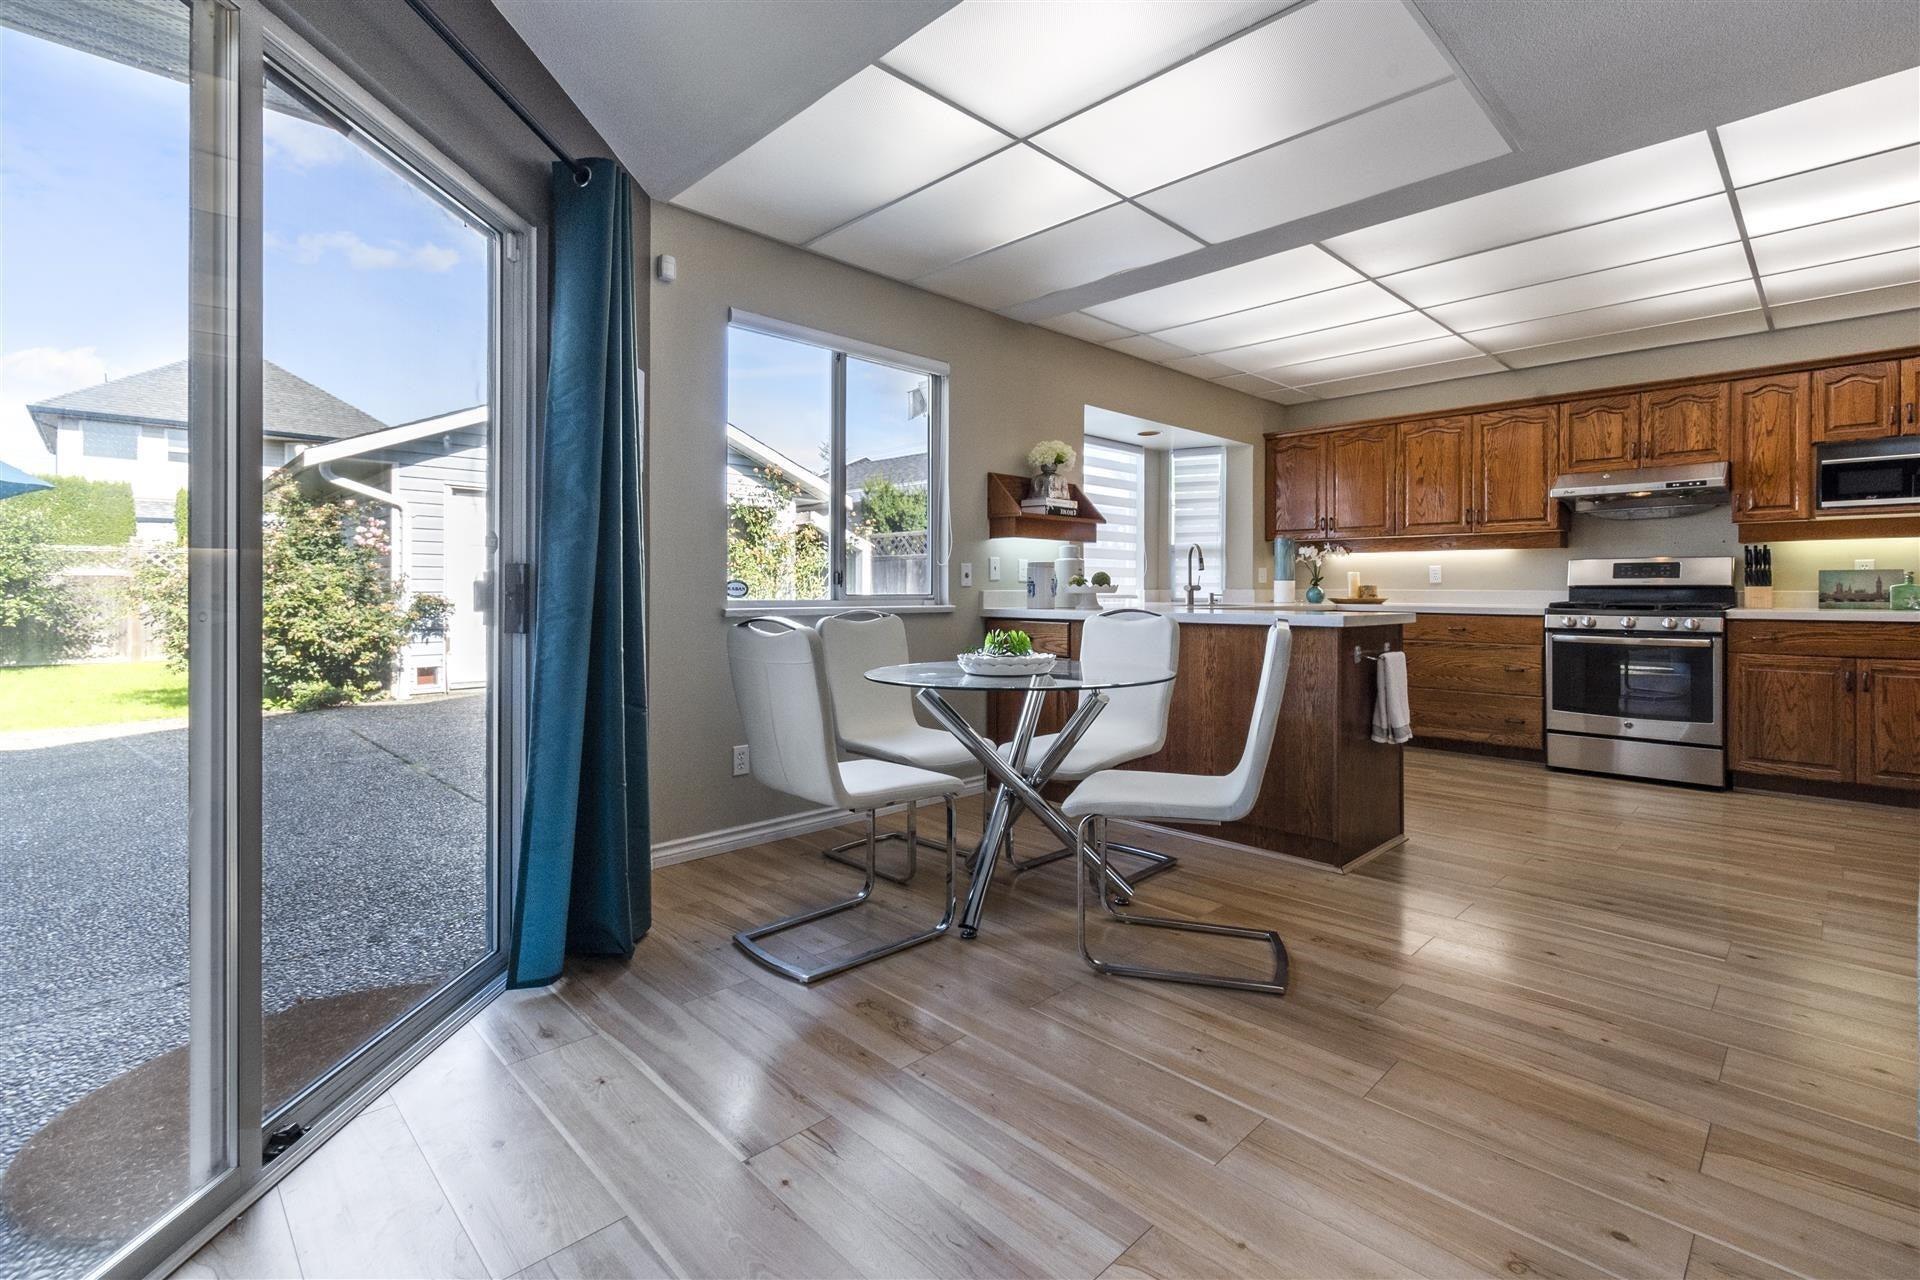 3631 GEORGIA STREET - Steveston Village House/Single Family for sale, 3 Bedrooms (R2623894) - #8